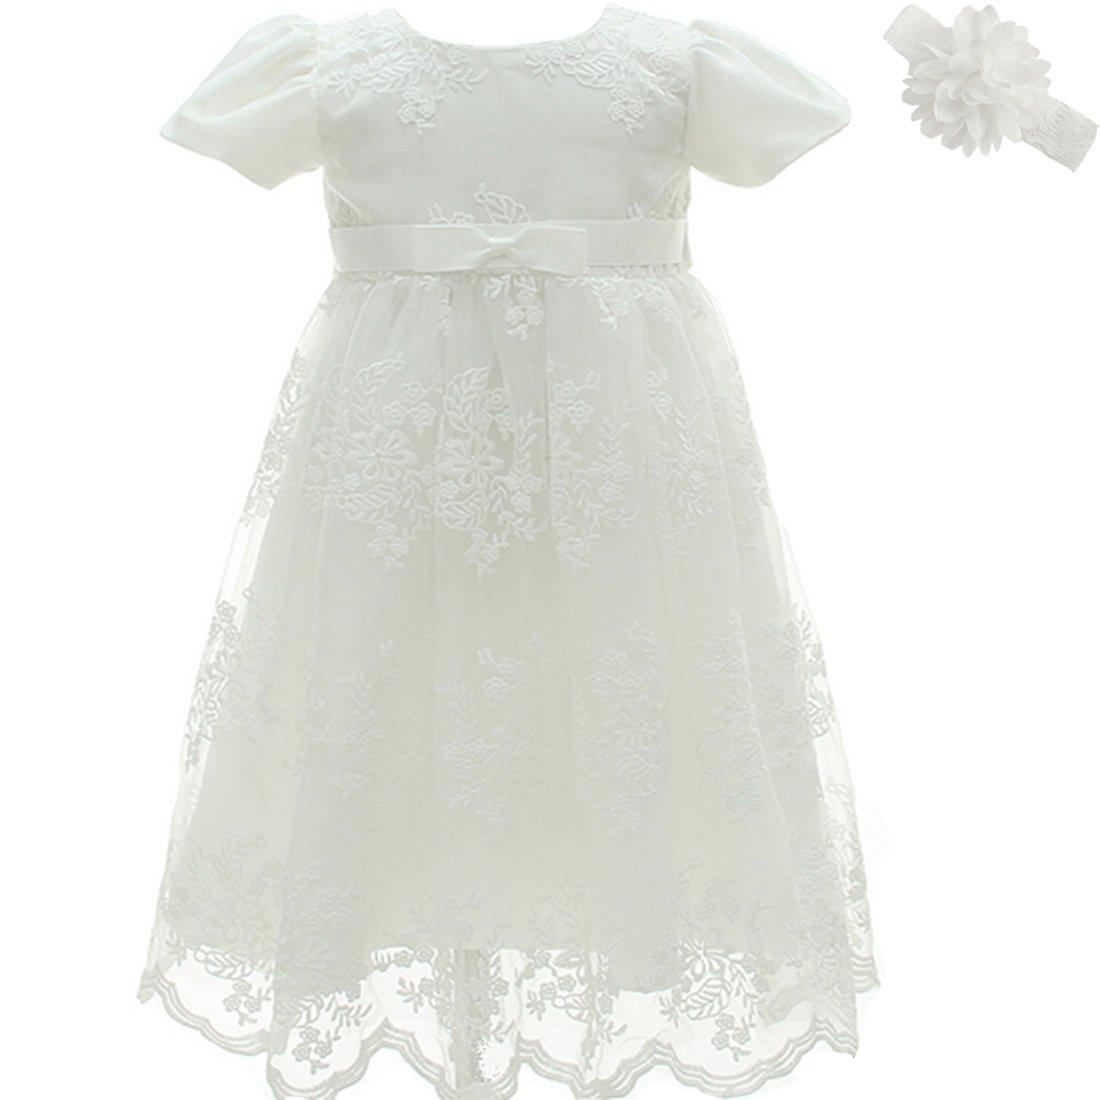 AHAHA Christening Baptism Long Dress Princess Wedding Formal Dress ZHHT388